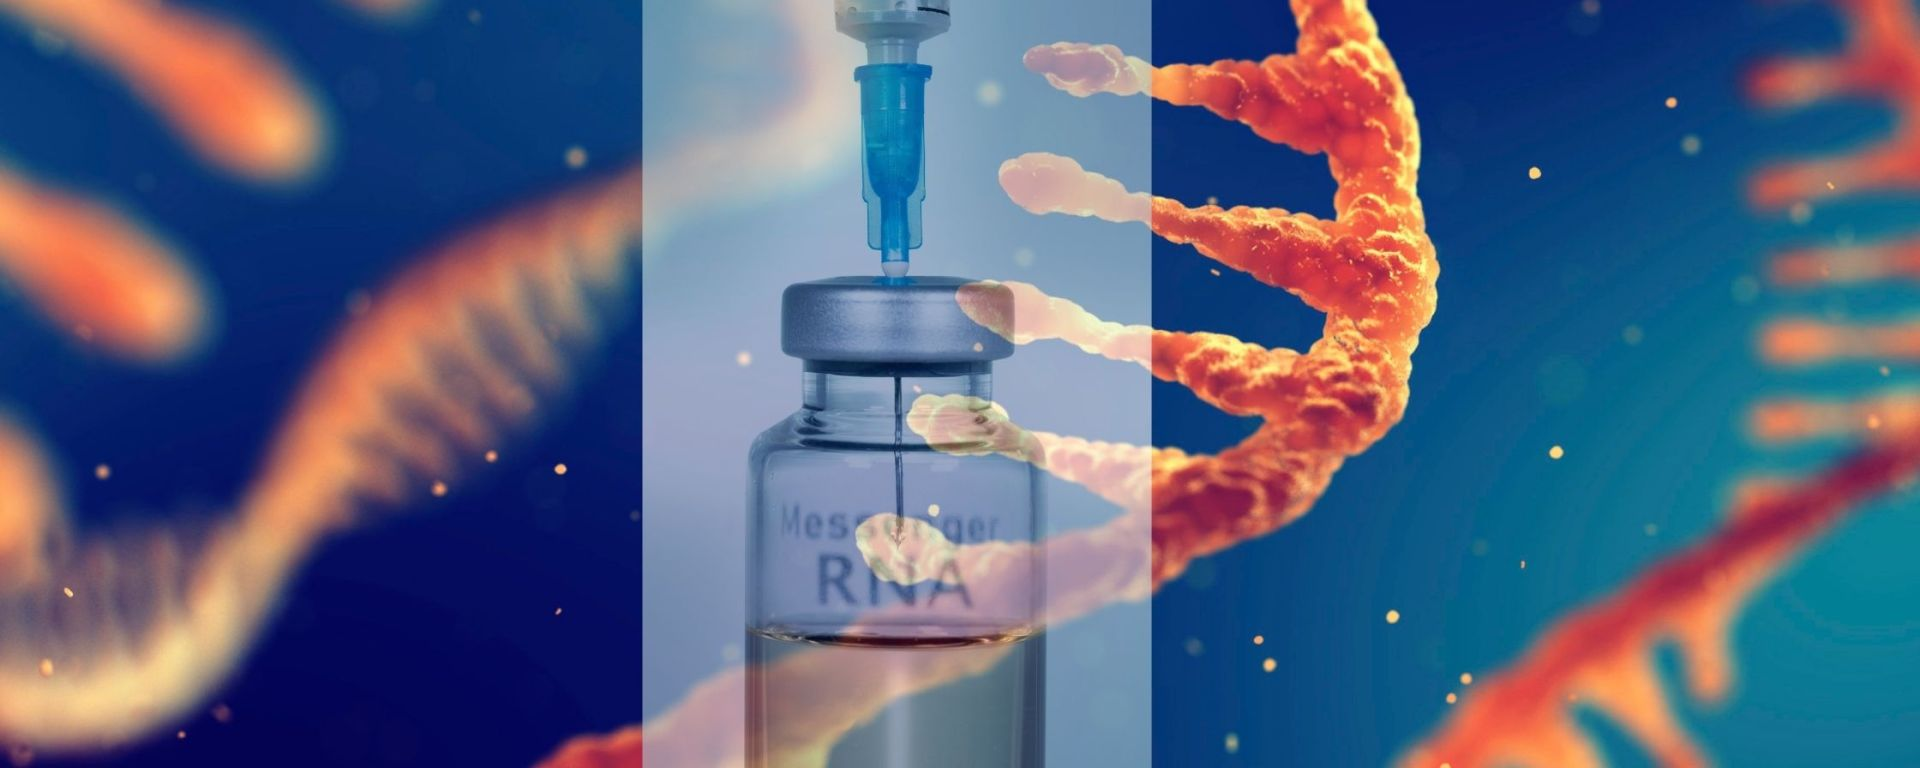 mRNA Cancer Treatment-The Scientific Triangle